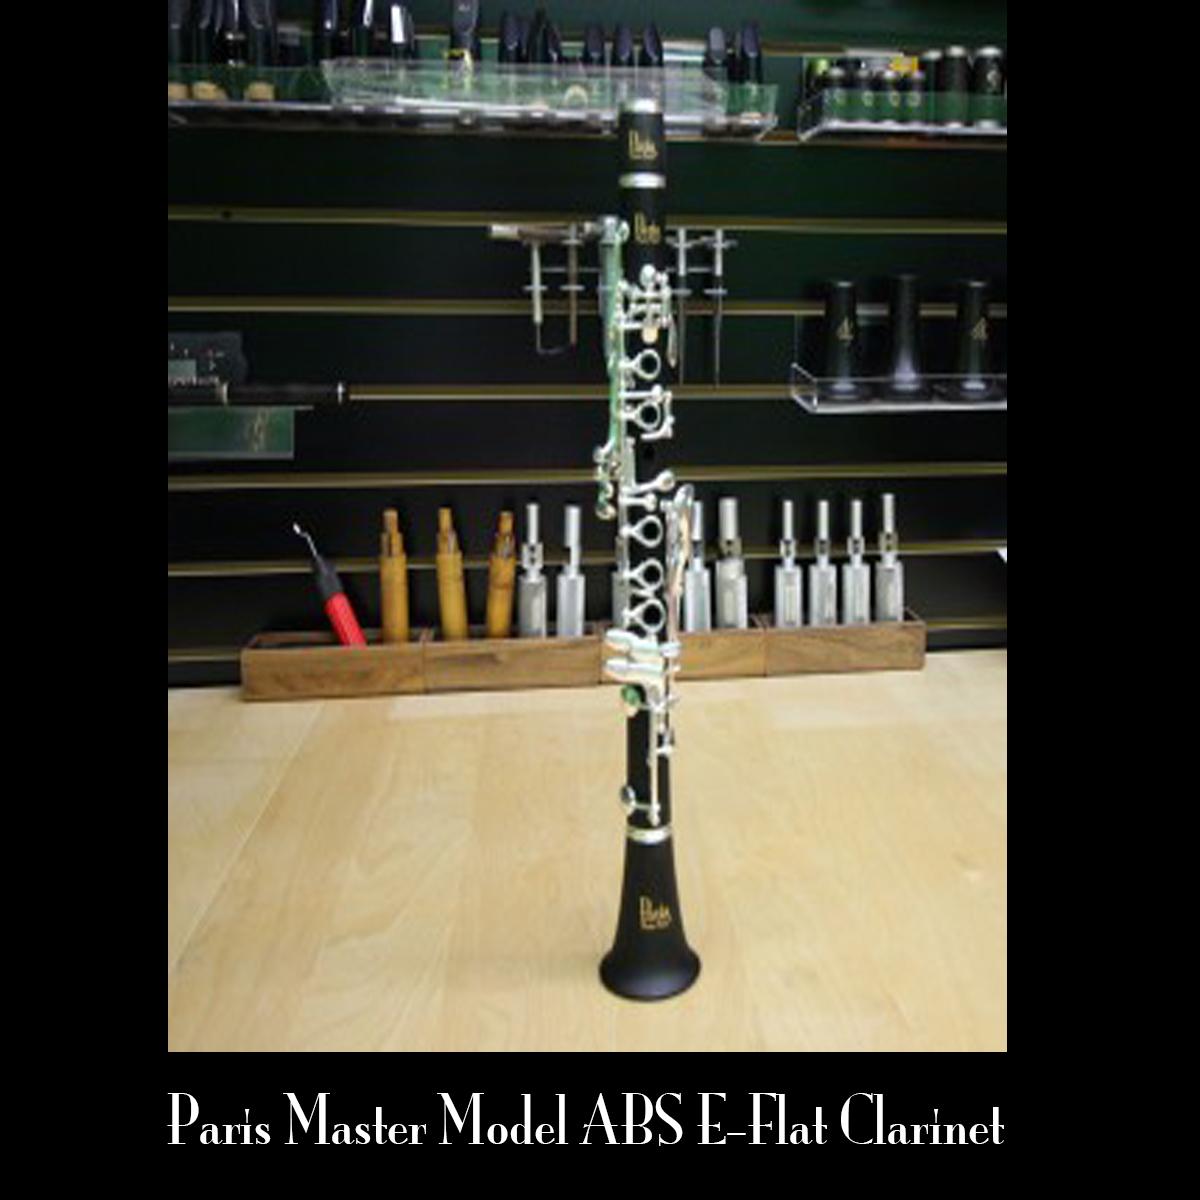 Paris Master Model E-Flat Clarinet